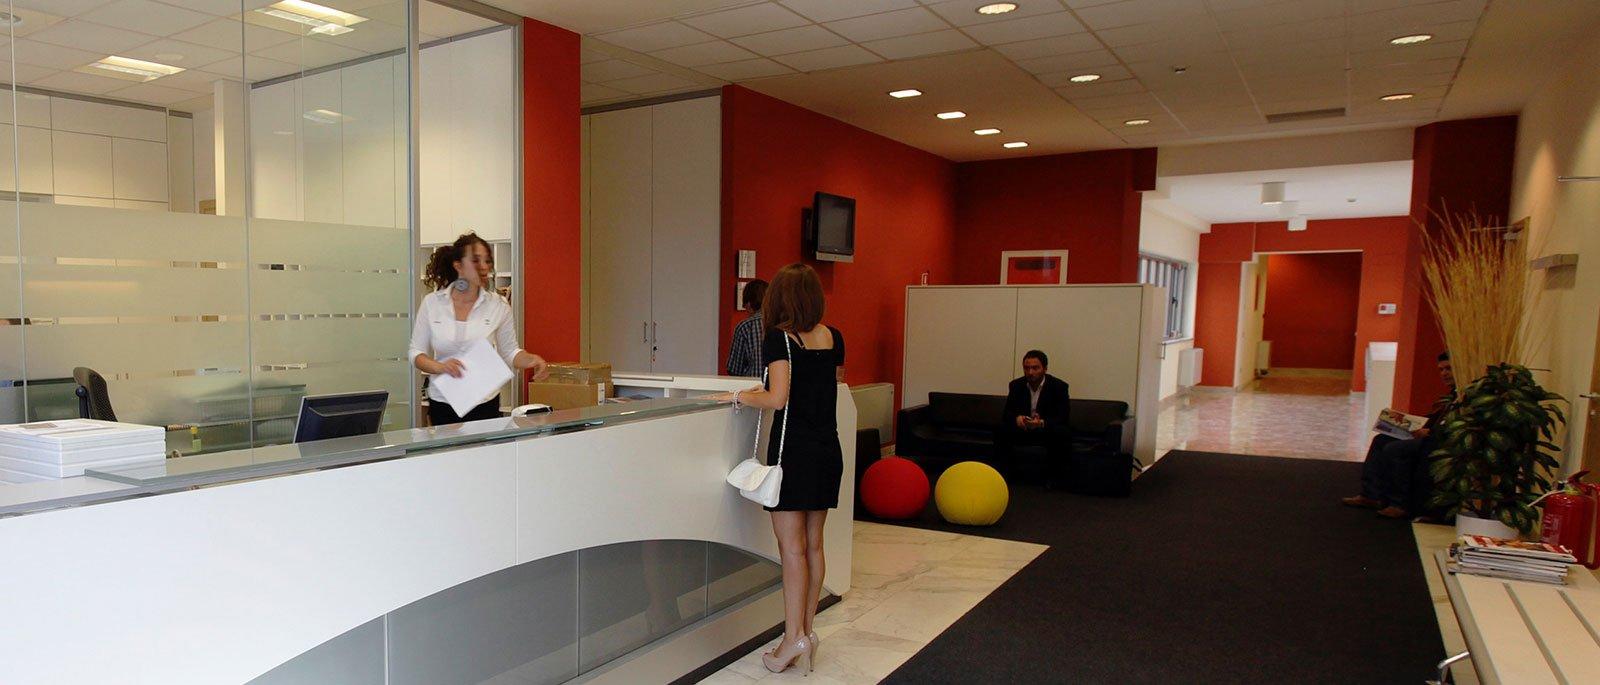 Uffici Pick Center